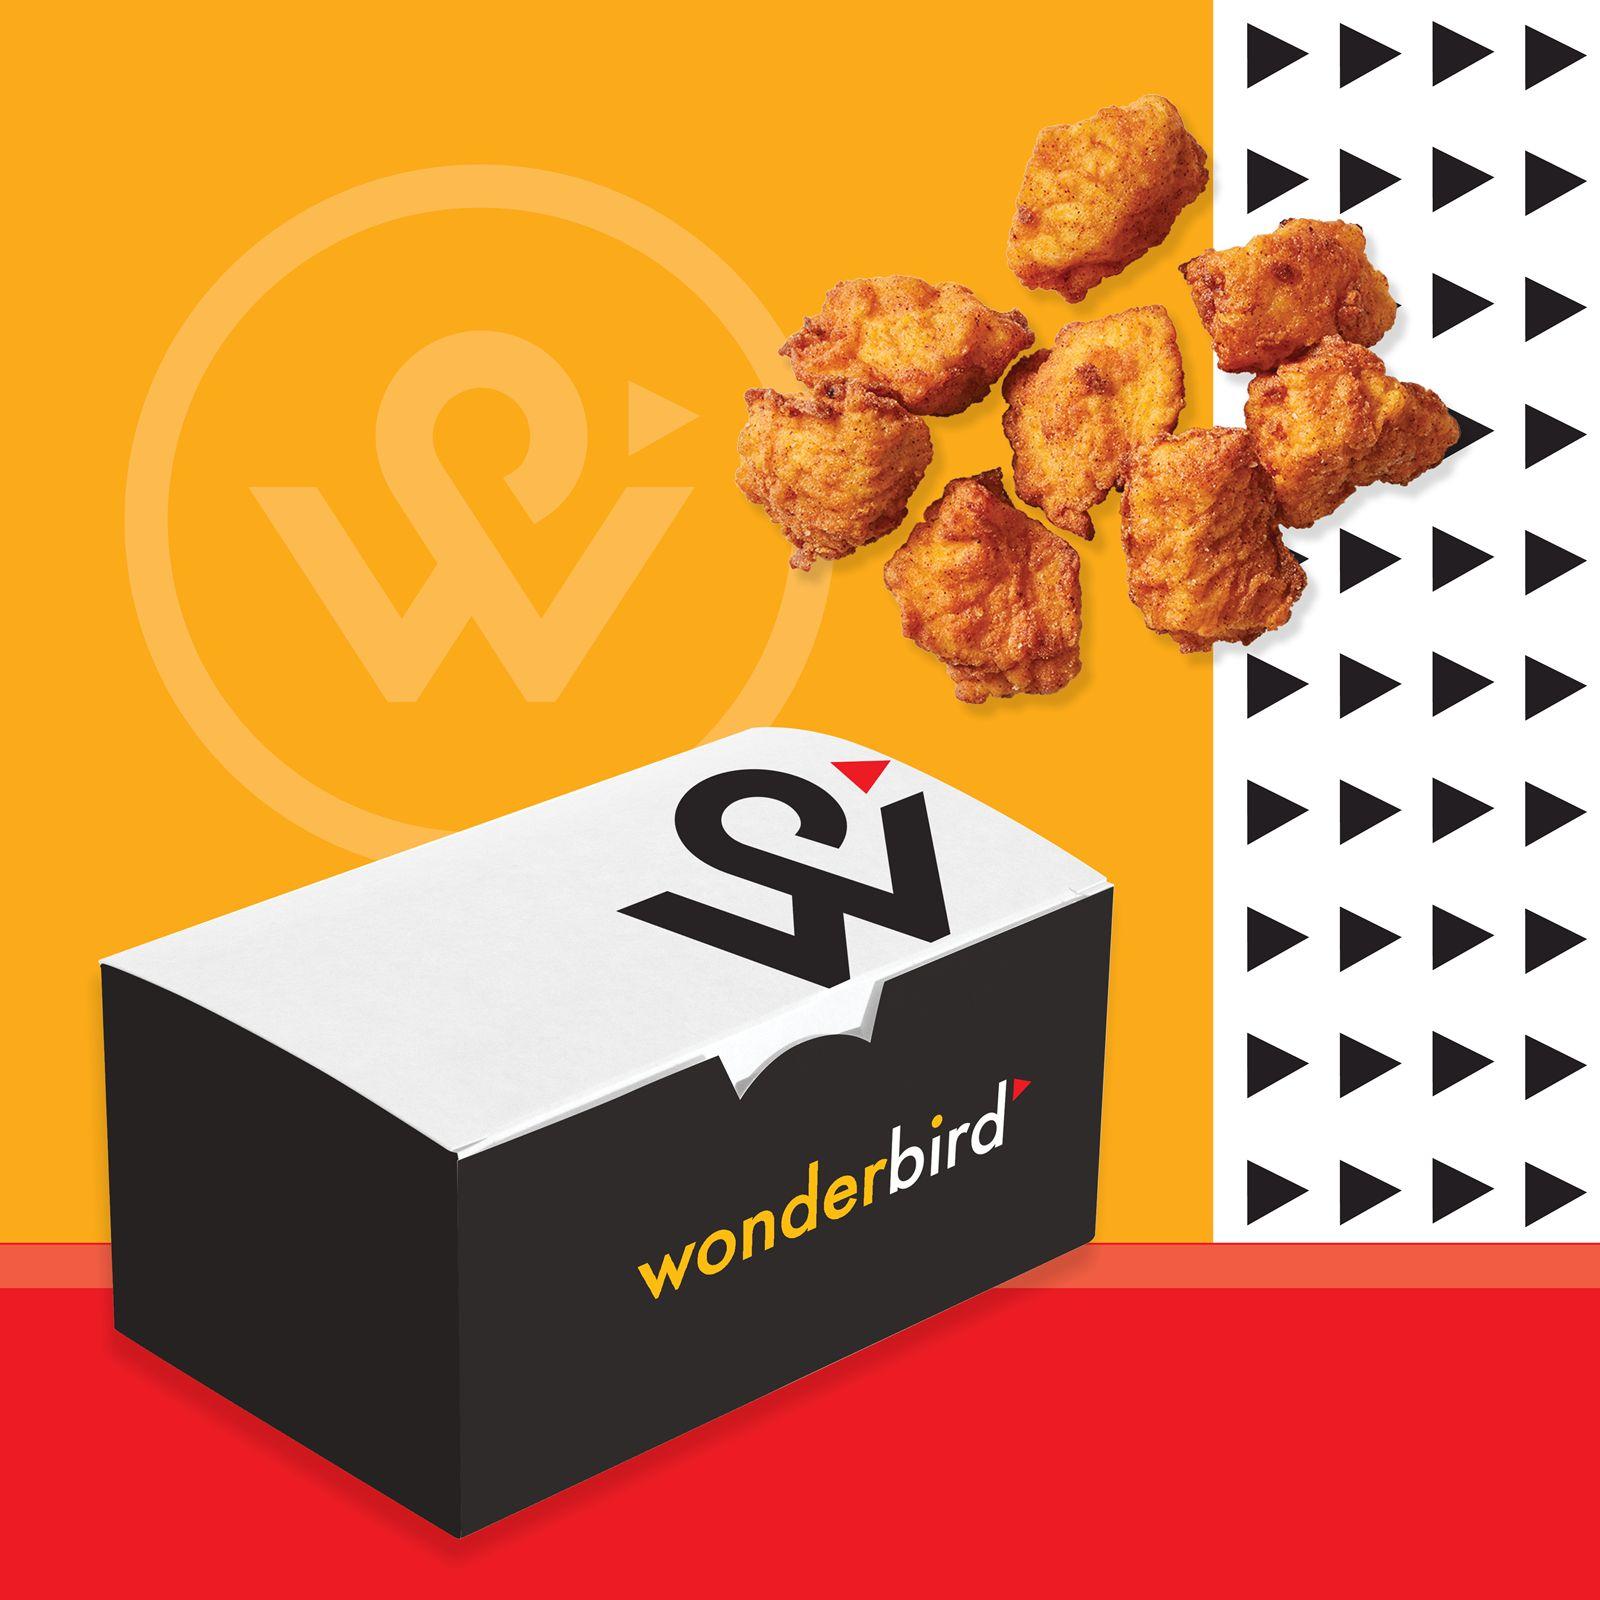 St. John Creates Brand Identity for New Fast Food Chicken Restaurant Wonderbird